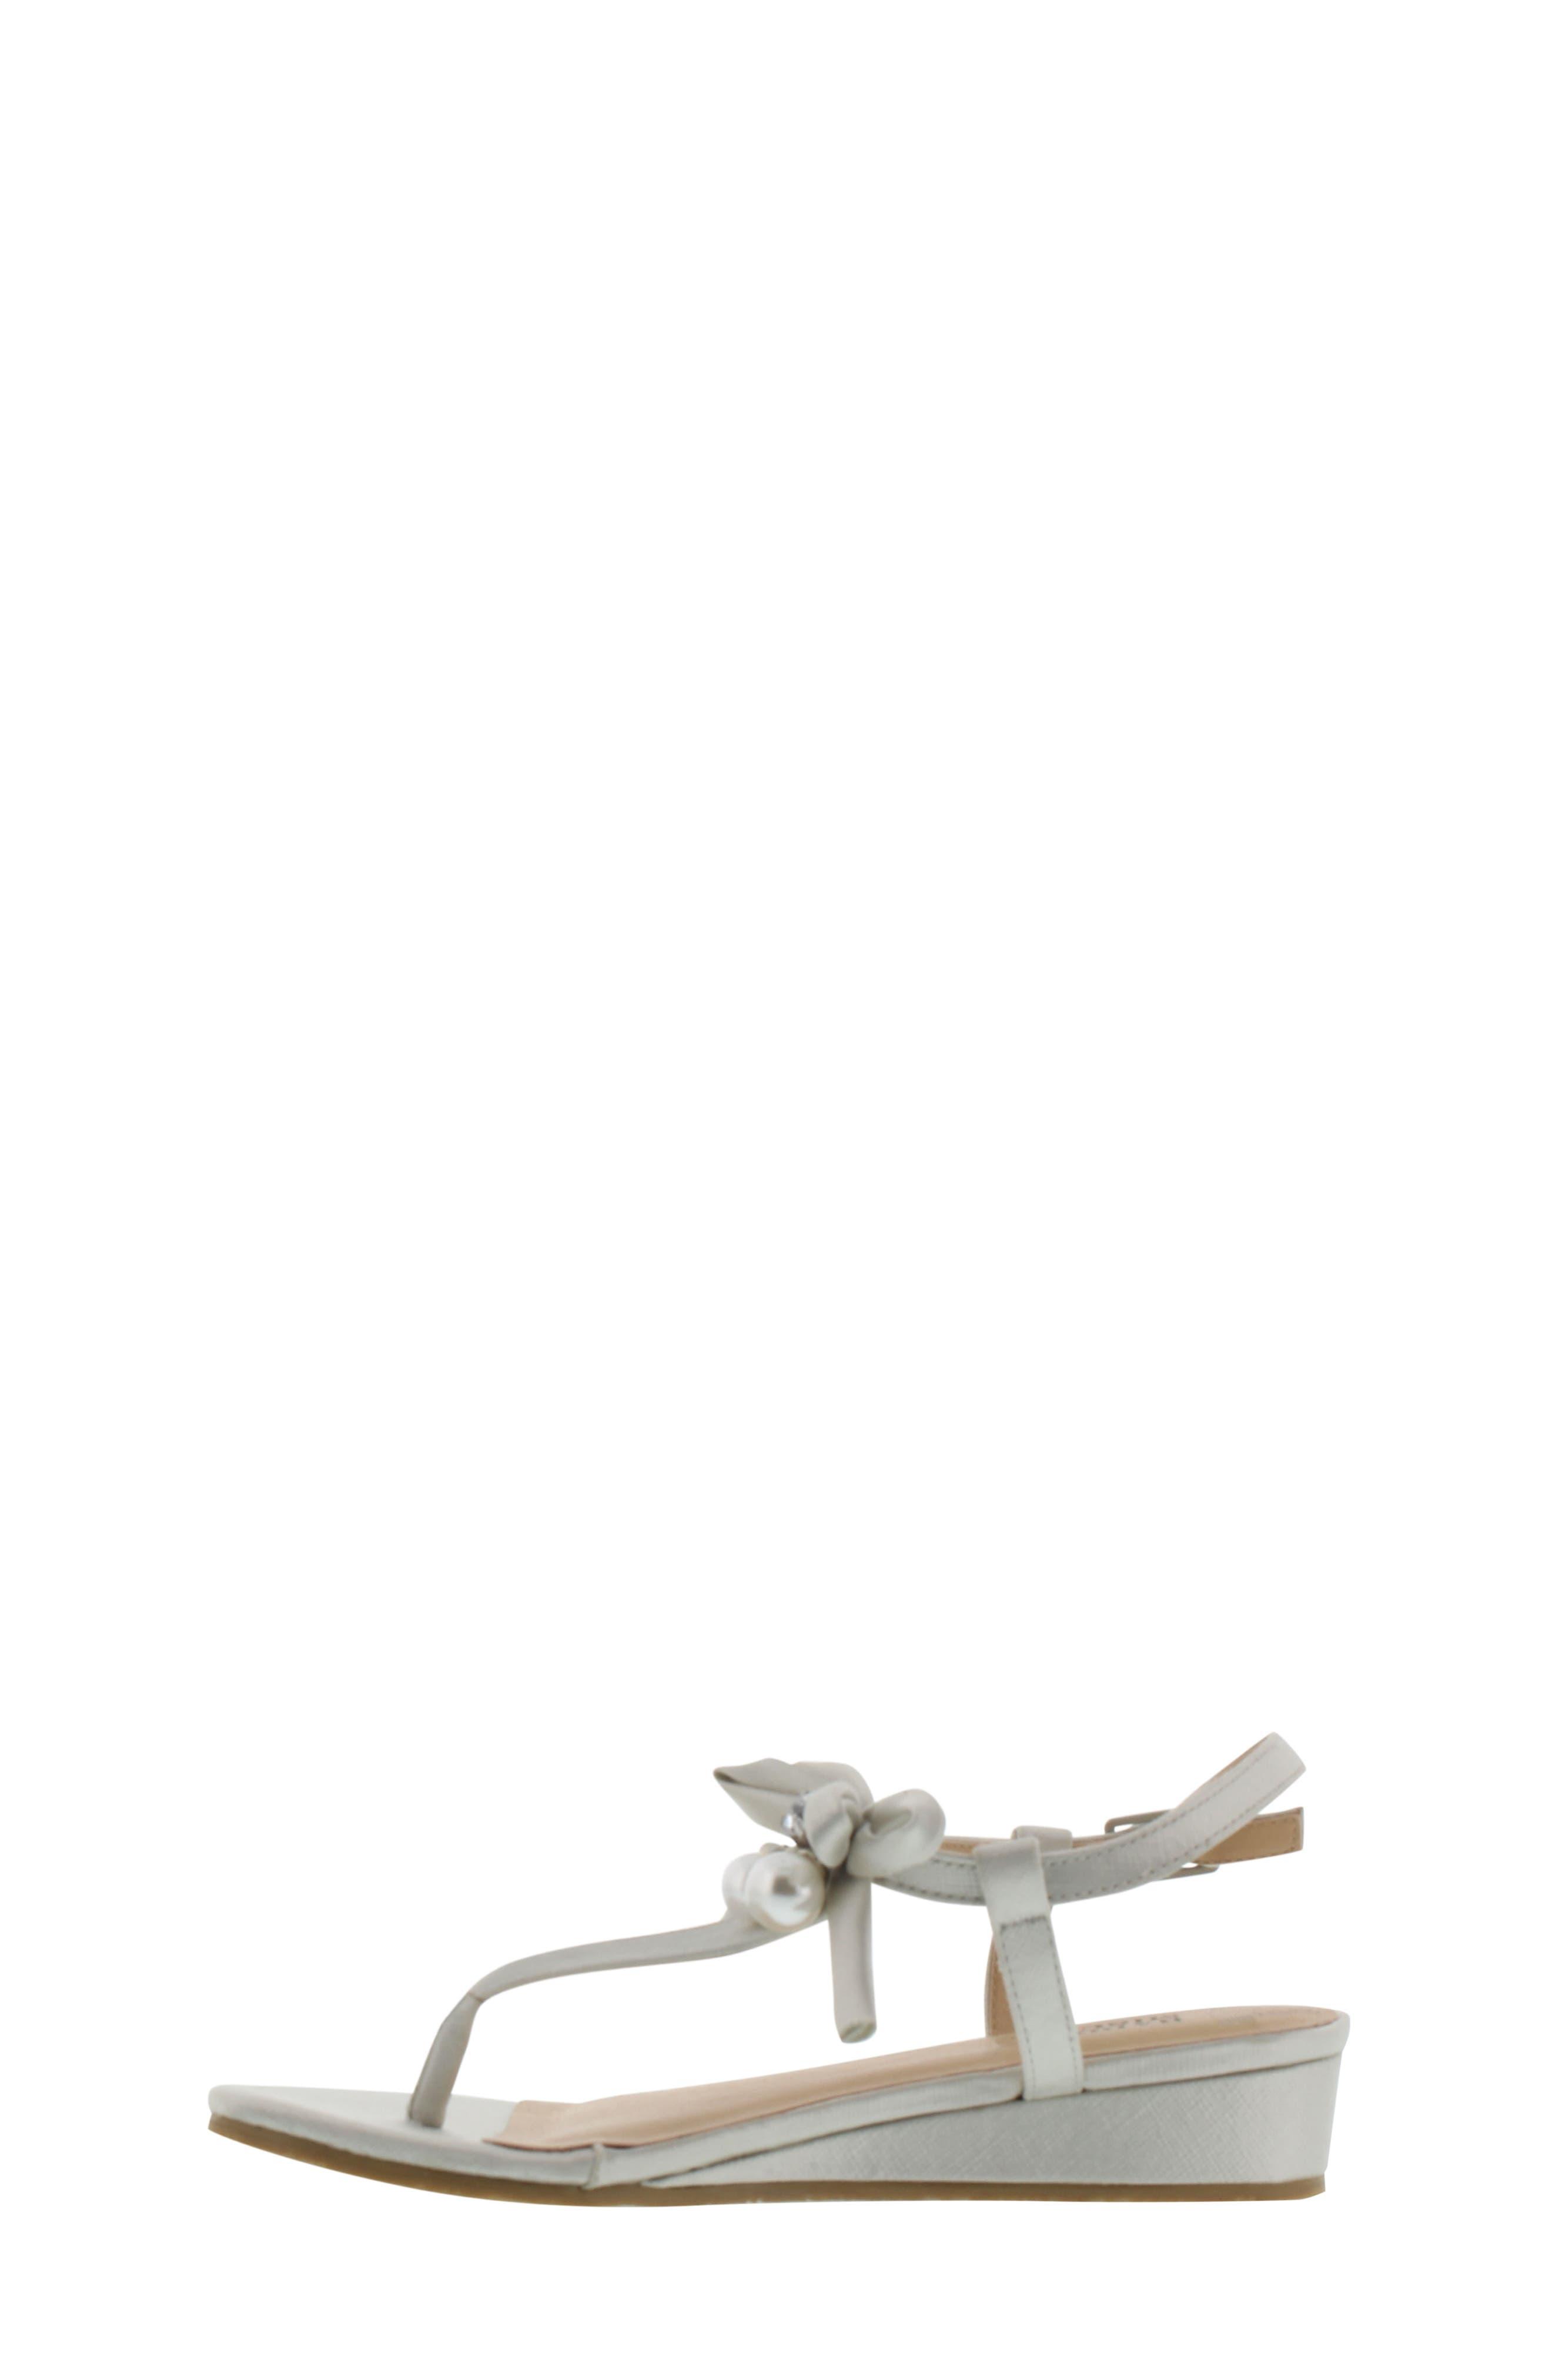 Talia Embellished Bow Sandal,                             Alternate thumbnail 3, color,                             Silver